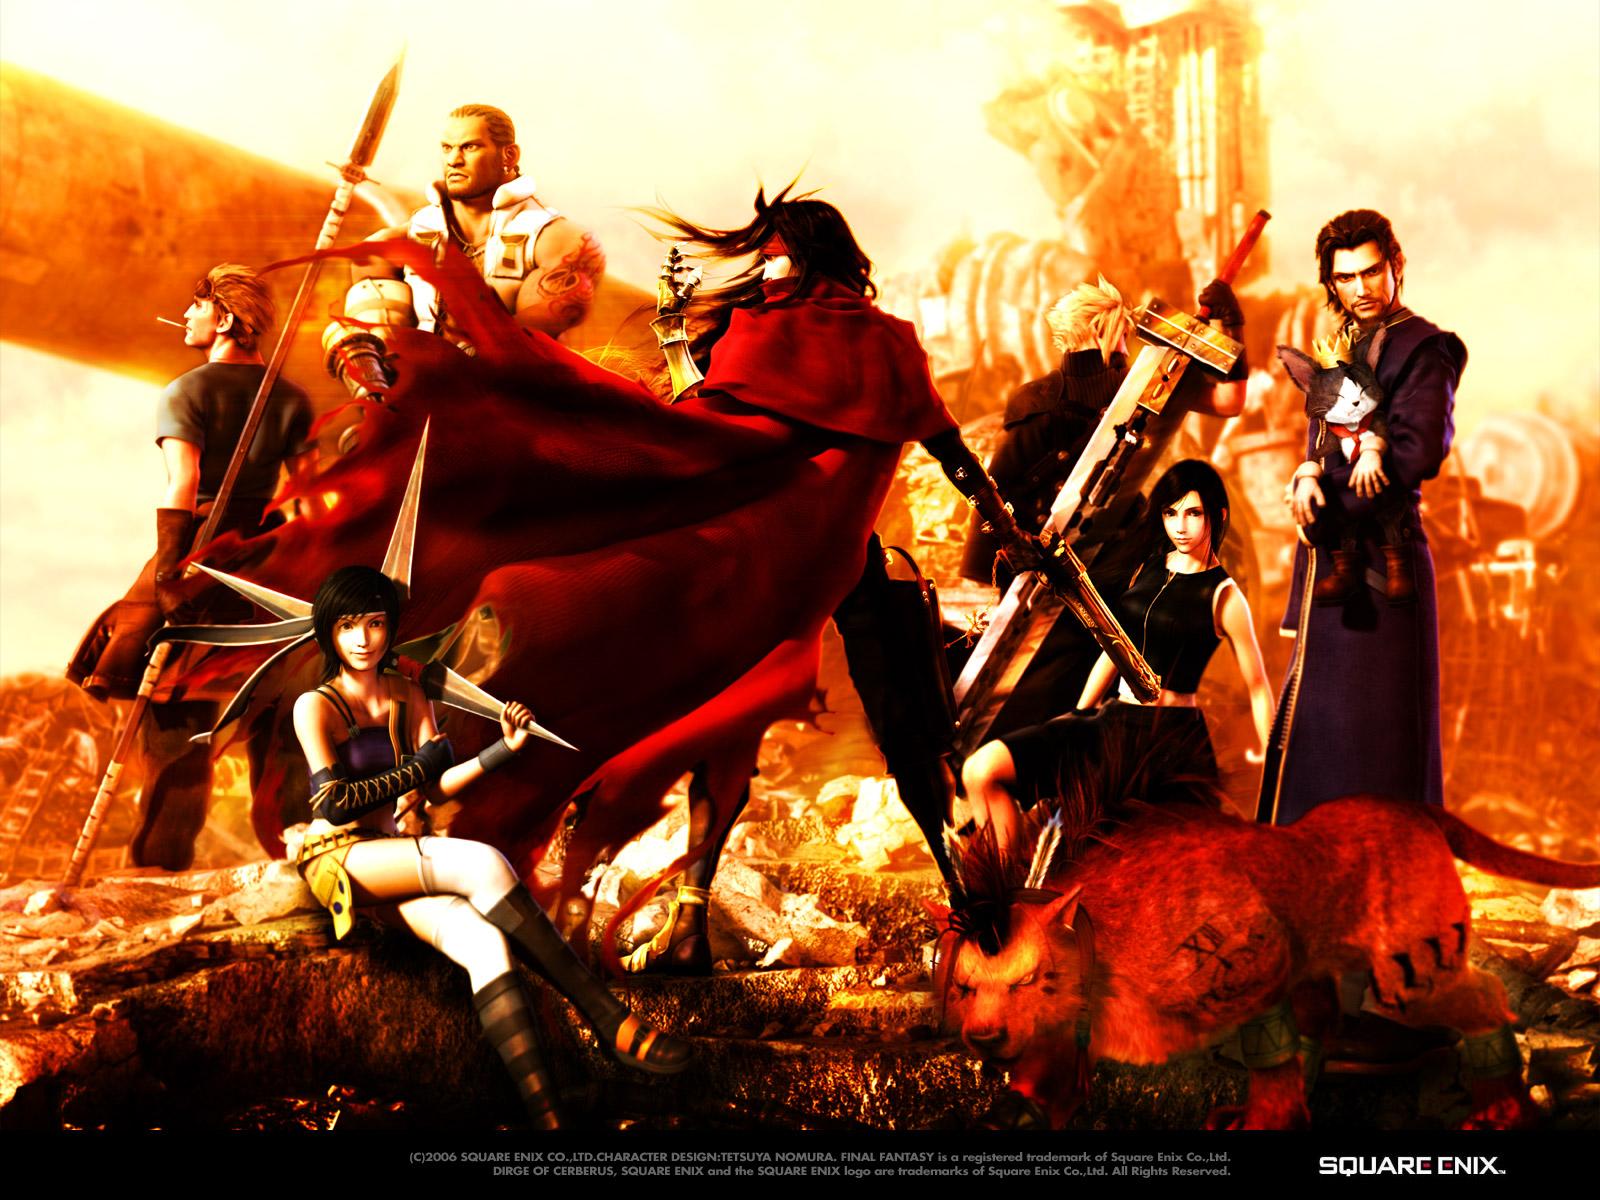 barret_wallace cait_sith cid_highwind cloud_strife final_fantasy final_fantasy_vii gun red red_xiii sword tifa_lockhart vincent_valentine weapon yuffie_kisaragi